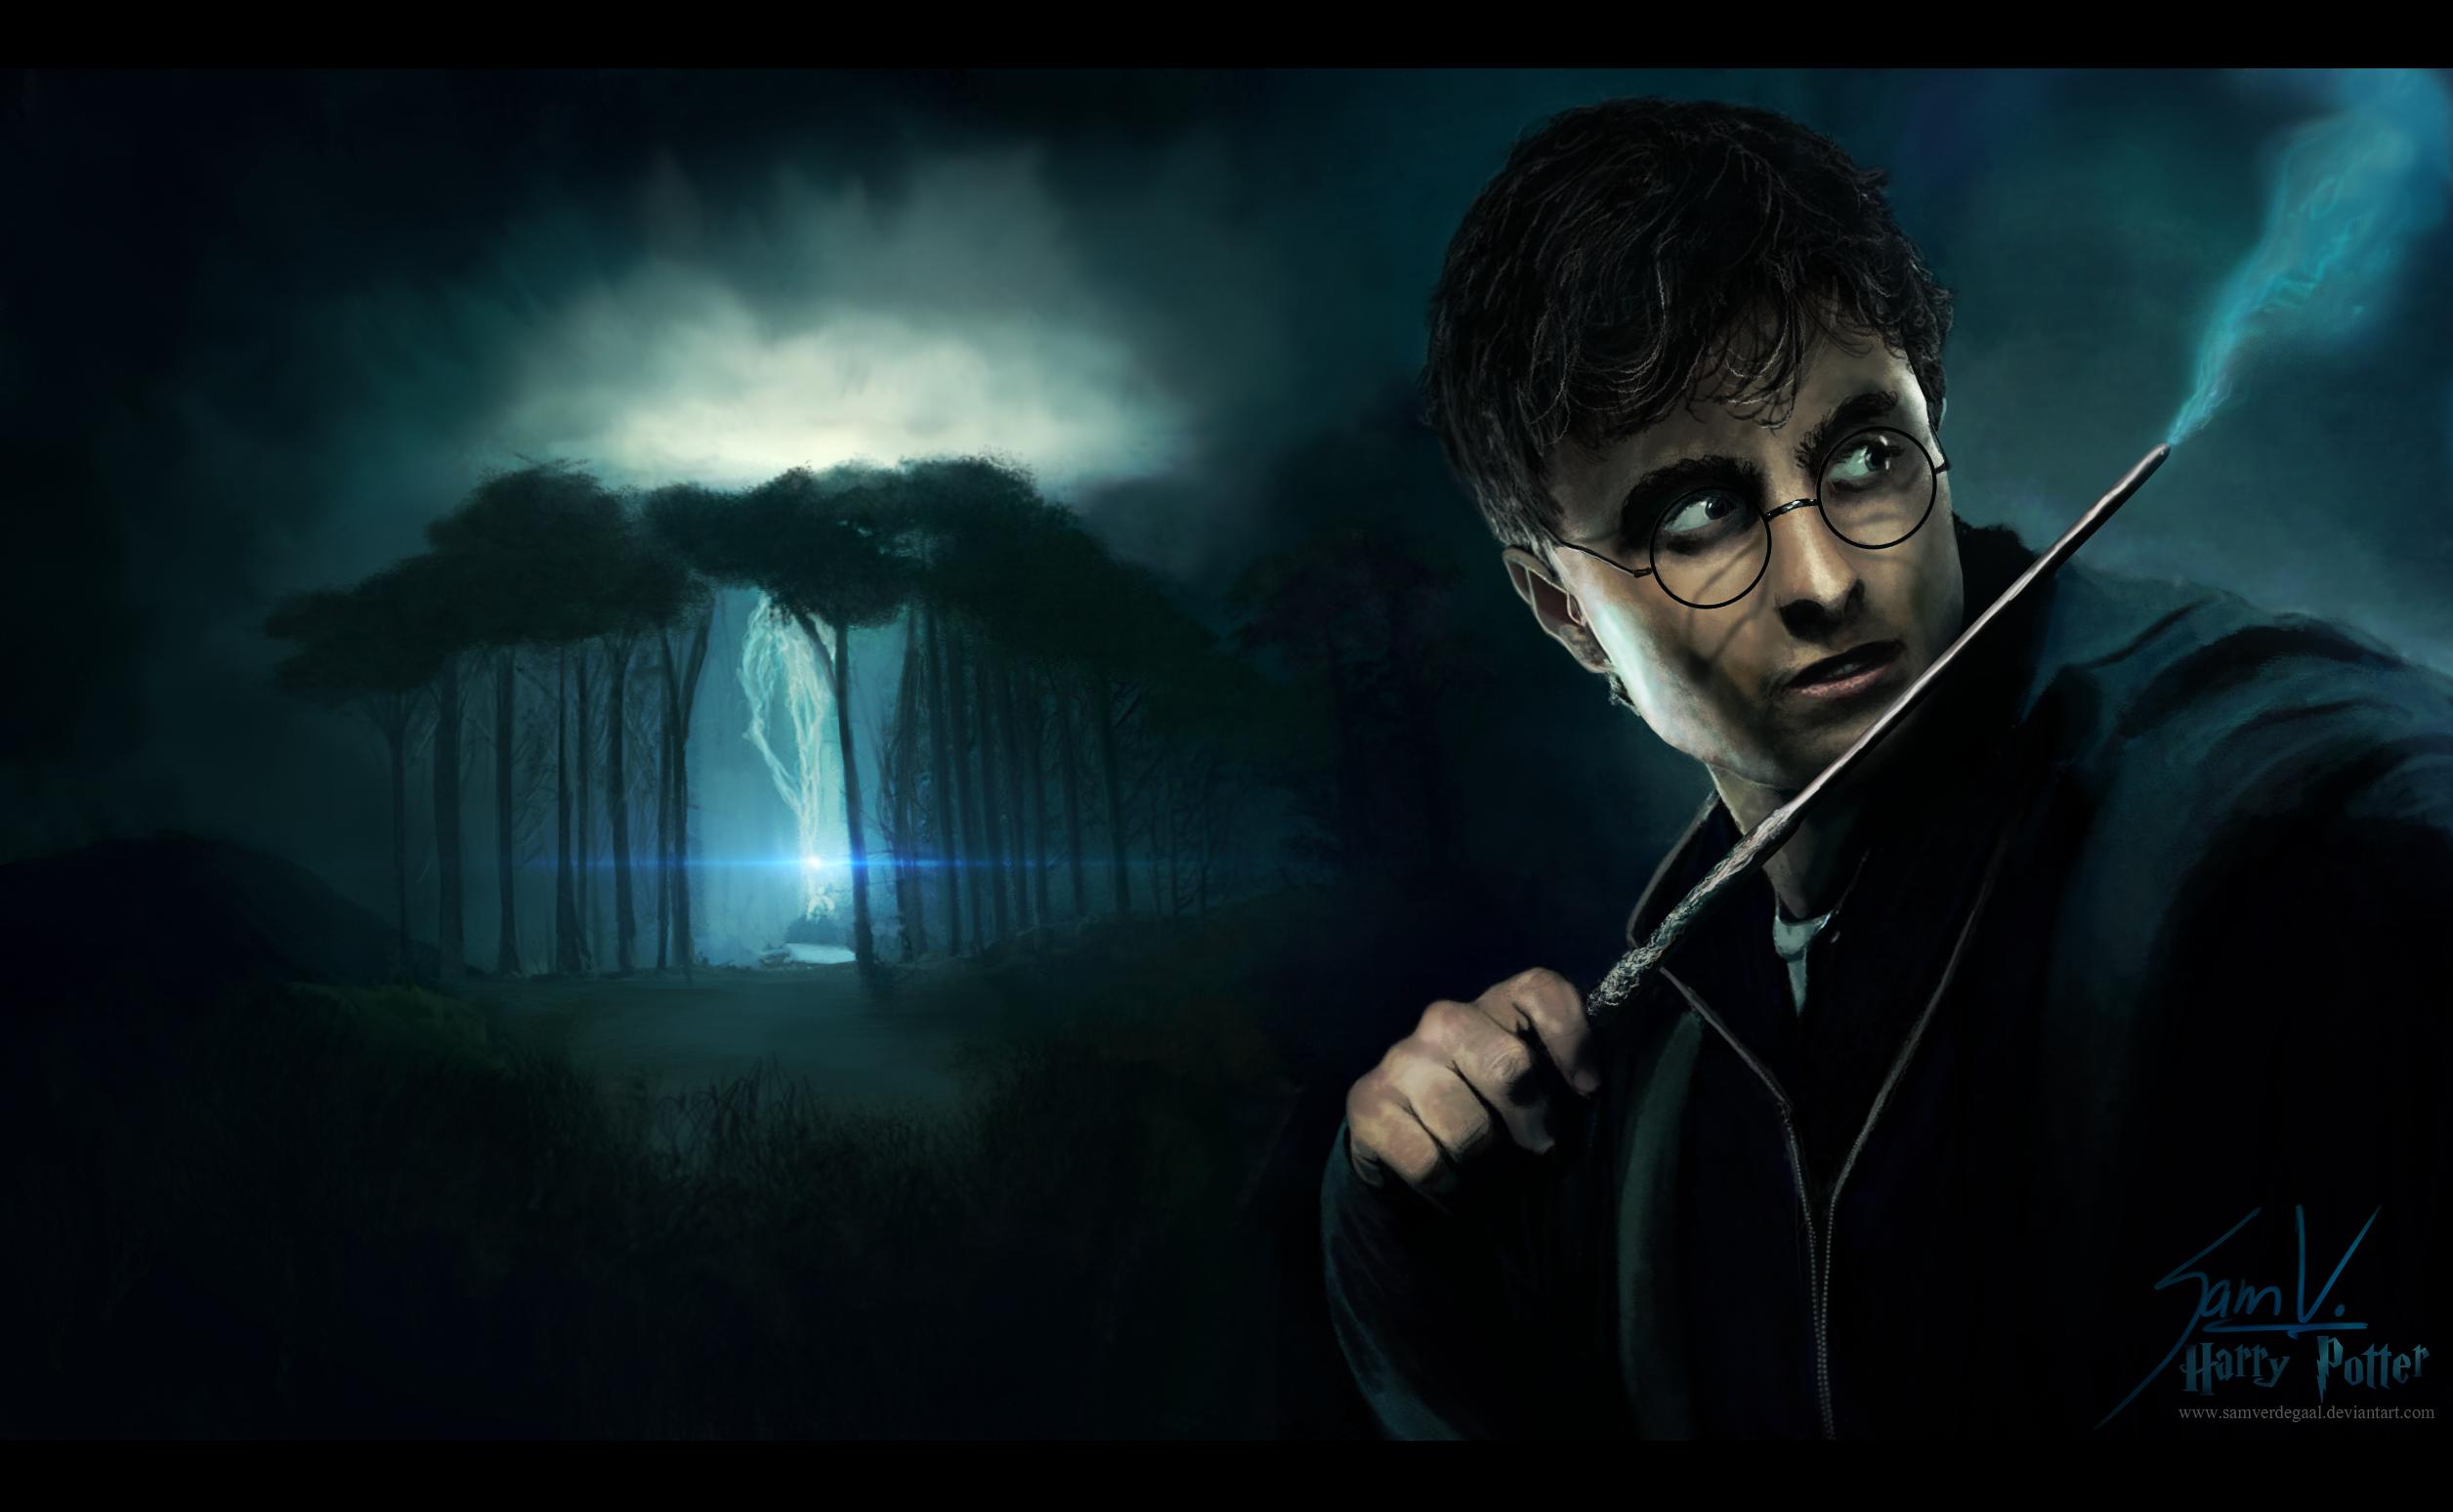 Cool Wallpaper Harry Potter Background - harry_potter___wallpaper_by_samverdegaal-d4se5ft  Pic_50218.png